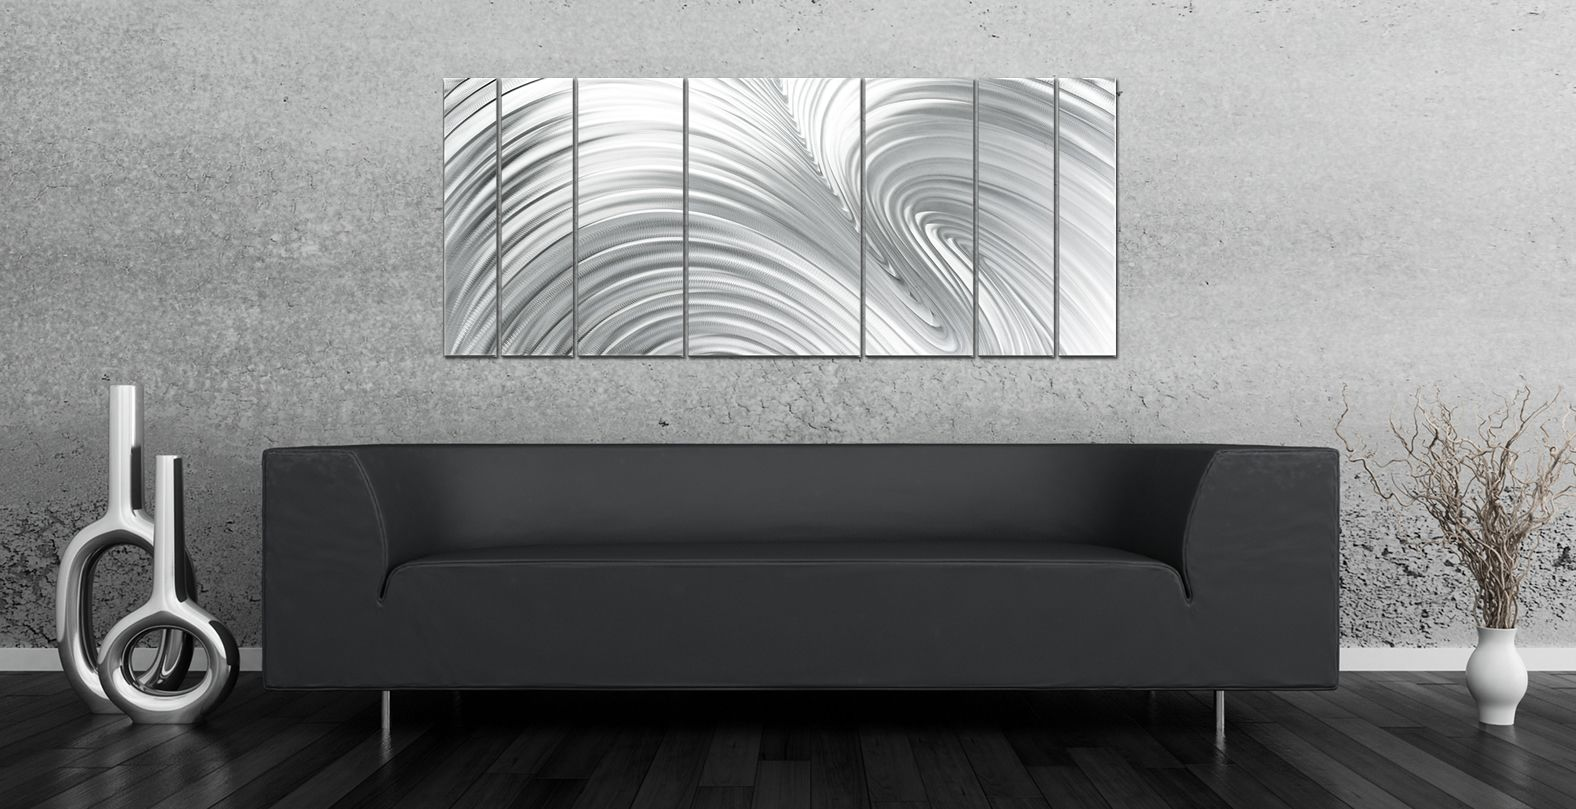 NY0169M - Metal Art by Nicholas Yust, Alternate Angle 5